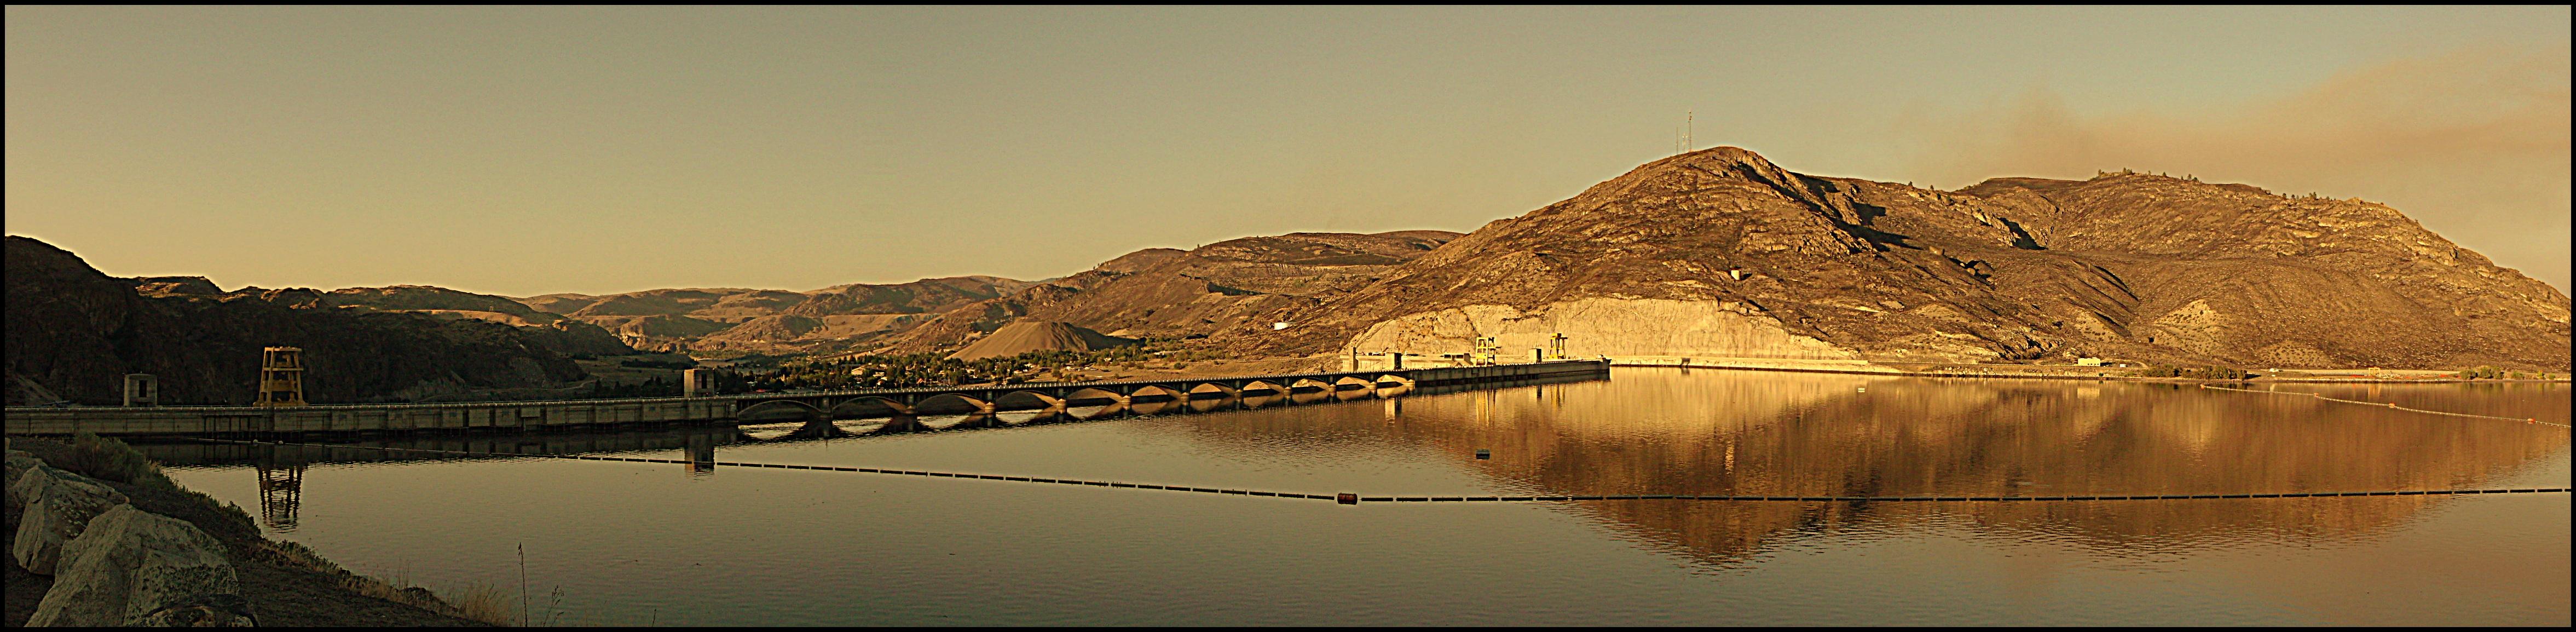 Grand Coulee Dam 4 by crimsonravenwarrior